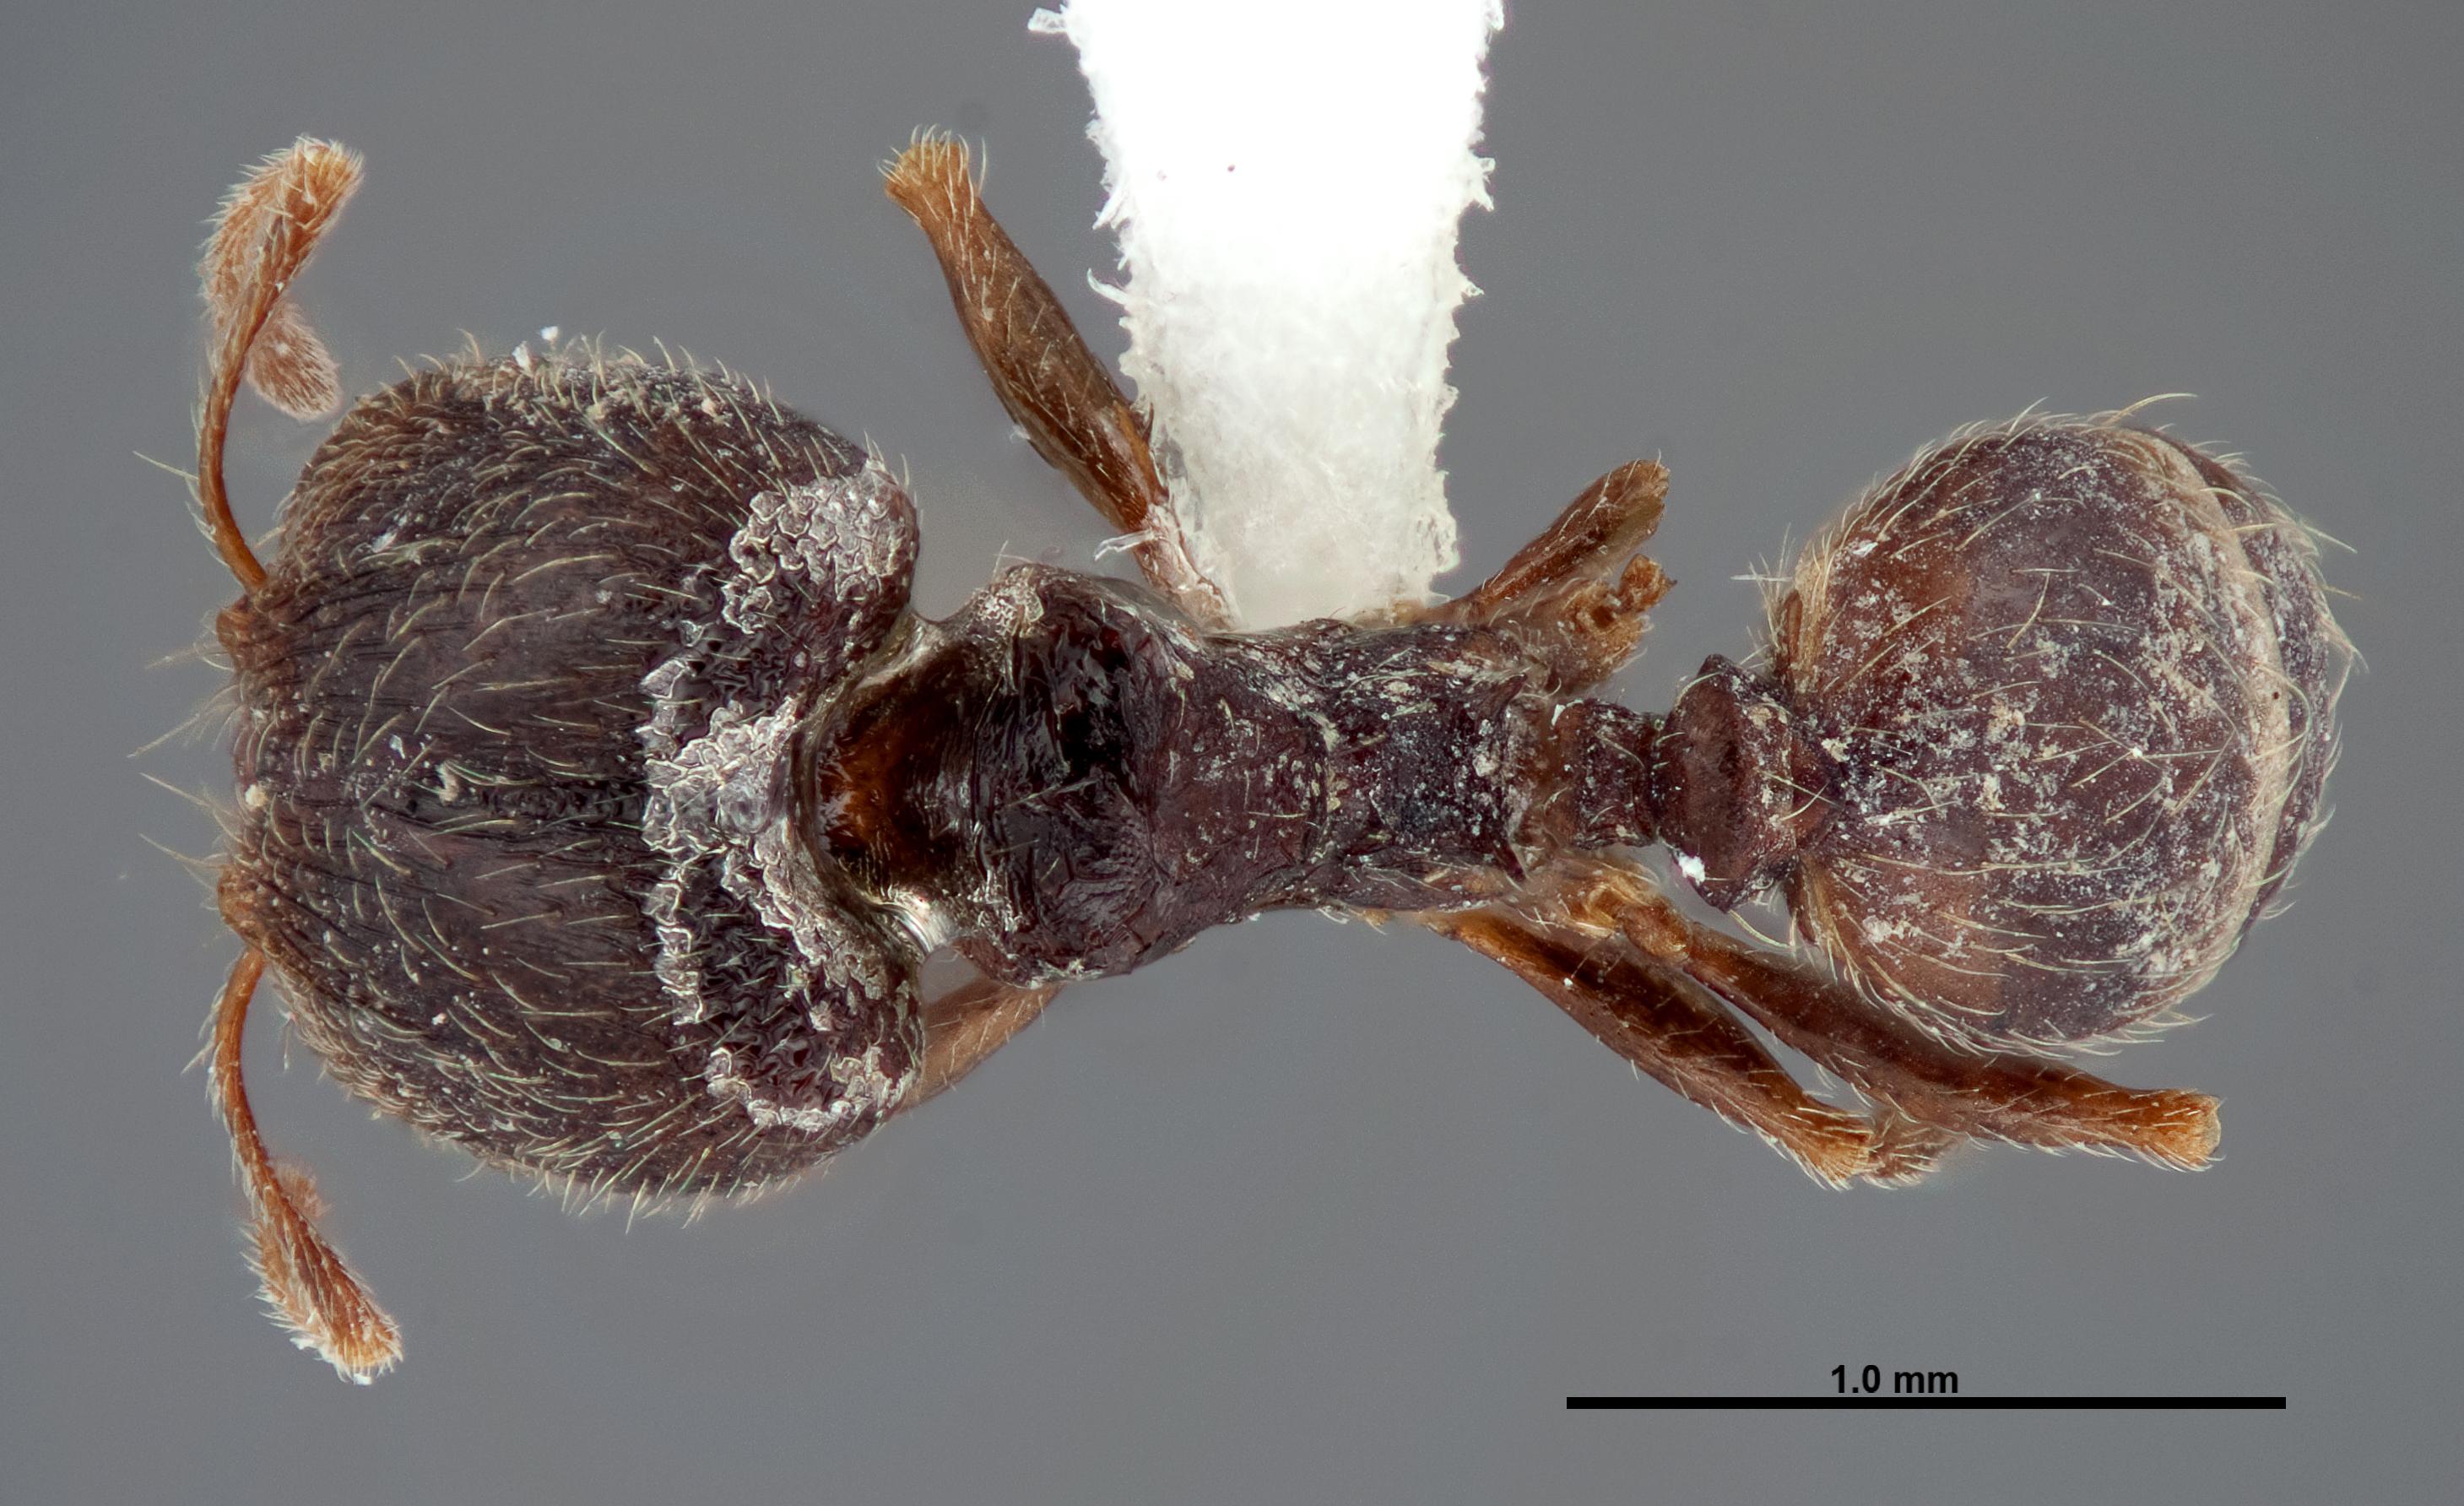 Image of Pheidole pilifera